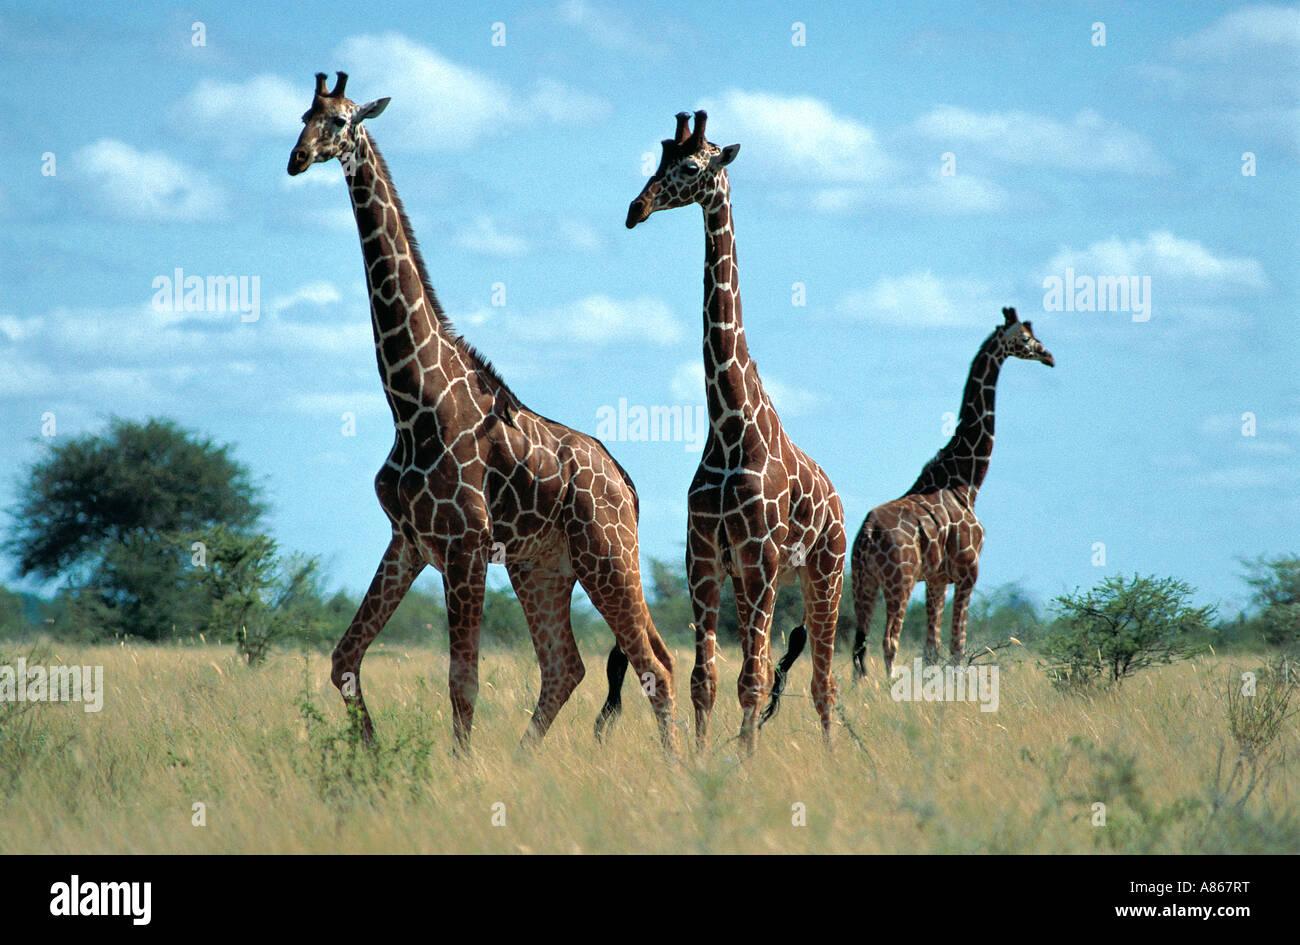 Tres Jirafa reticulada El Parque Nacional Meru, Kenya Imagen De Stock